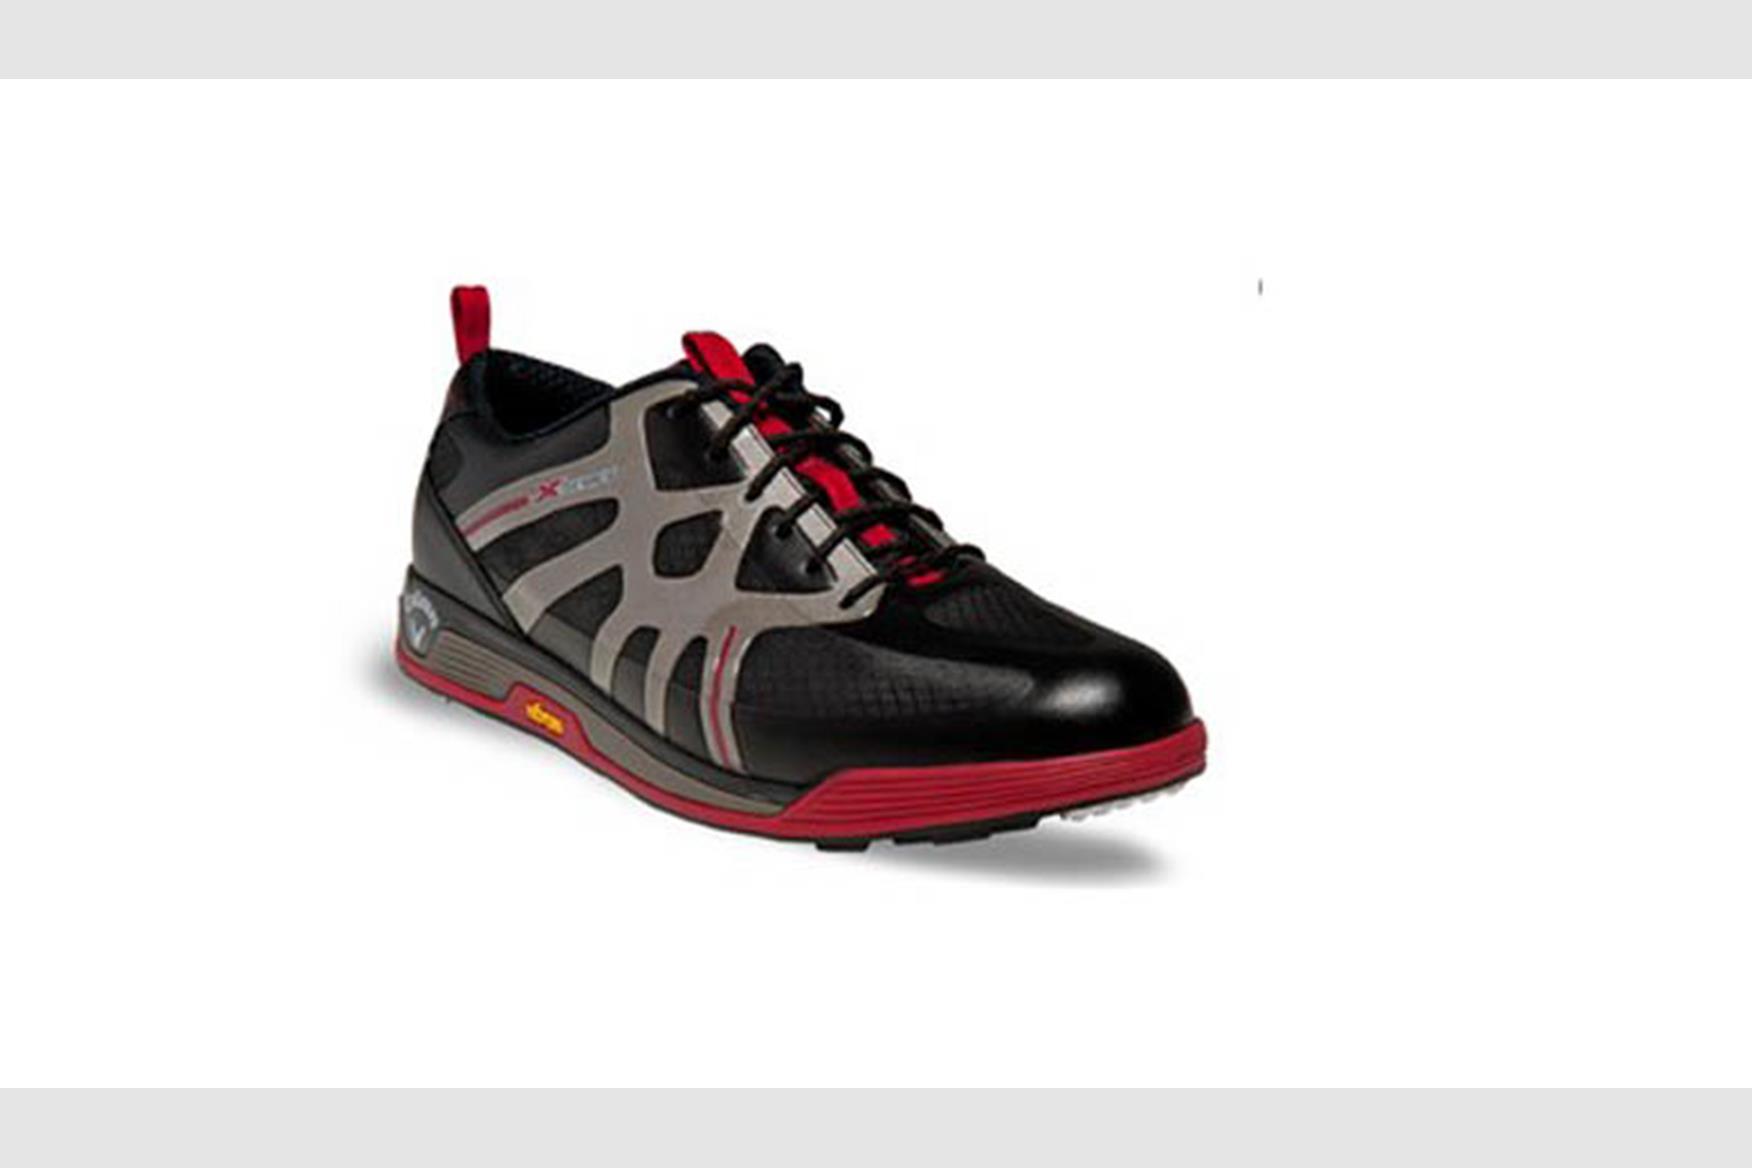 3d574d5f1562 Callaway Golf Shoes Reviews   Today's Golfer